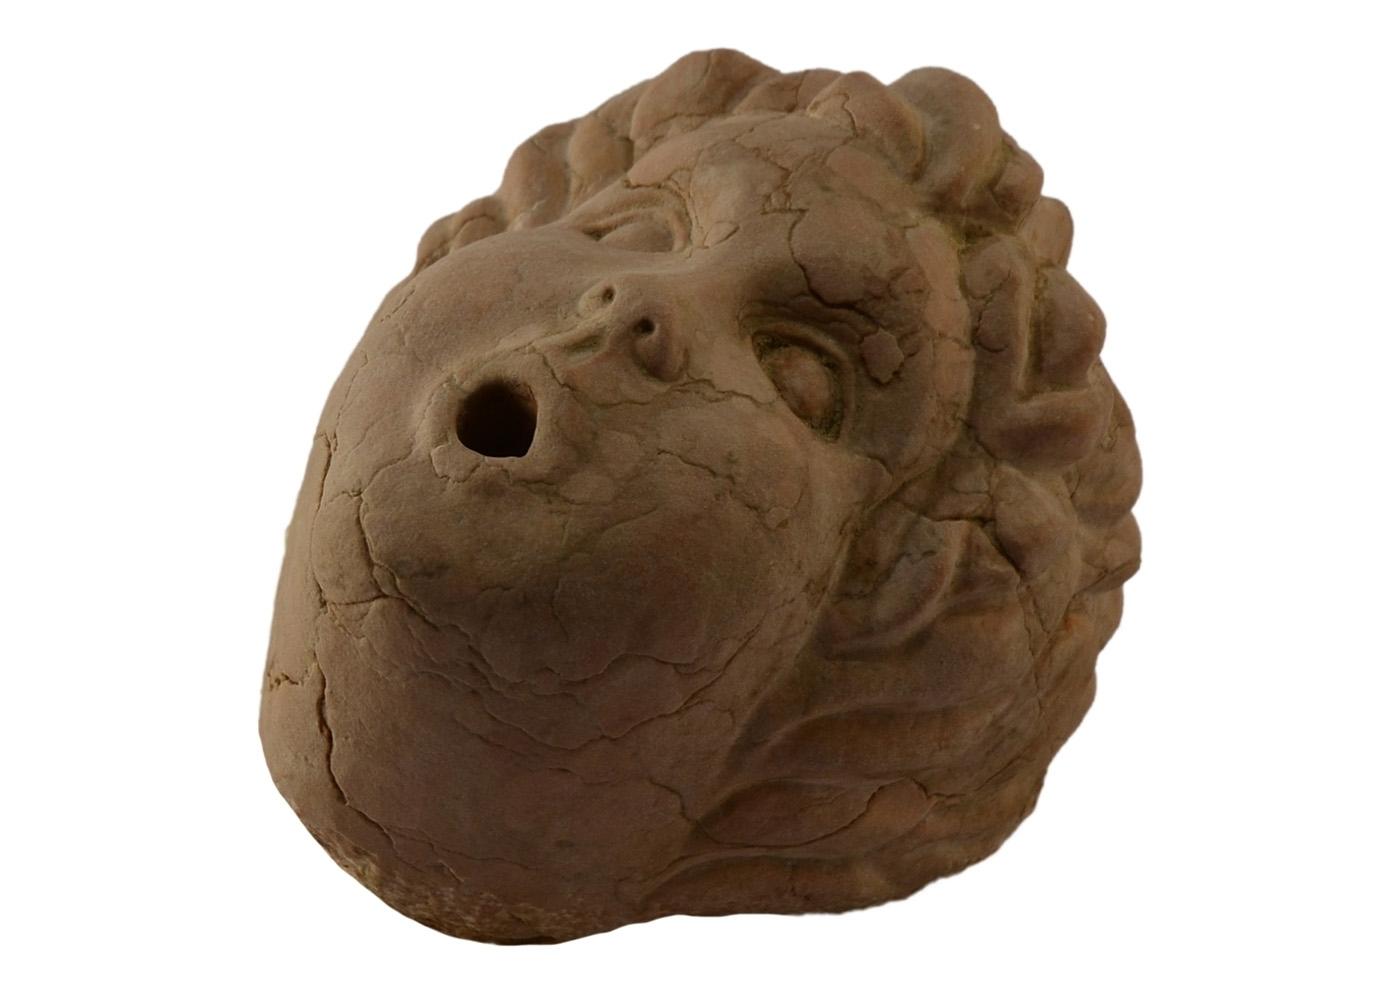 Buy Marble Sculpture Cherub Head Handmade 17457745 | Italy2Us.com